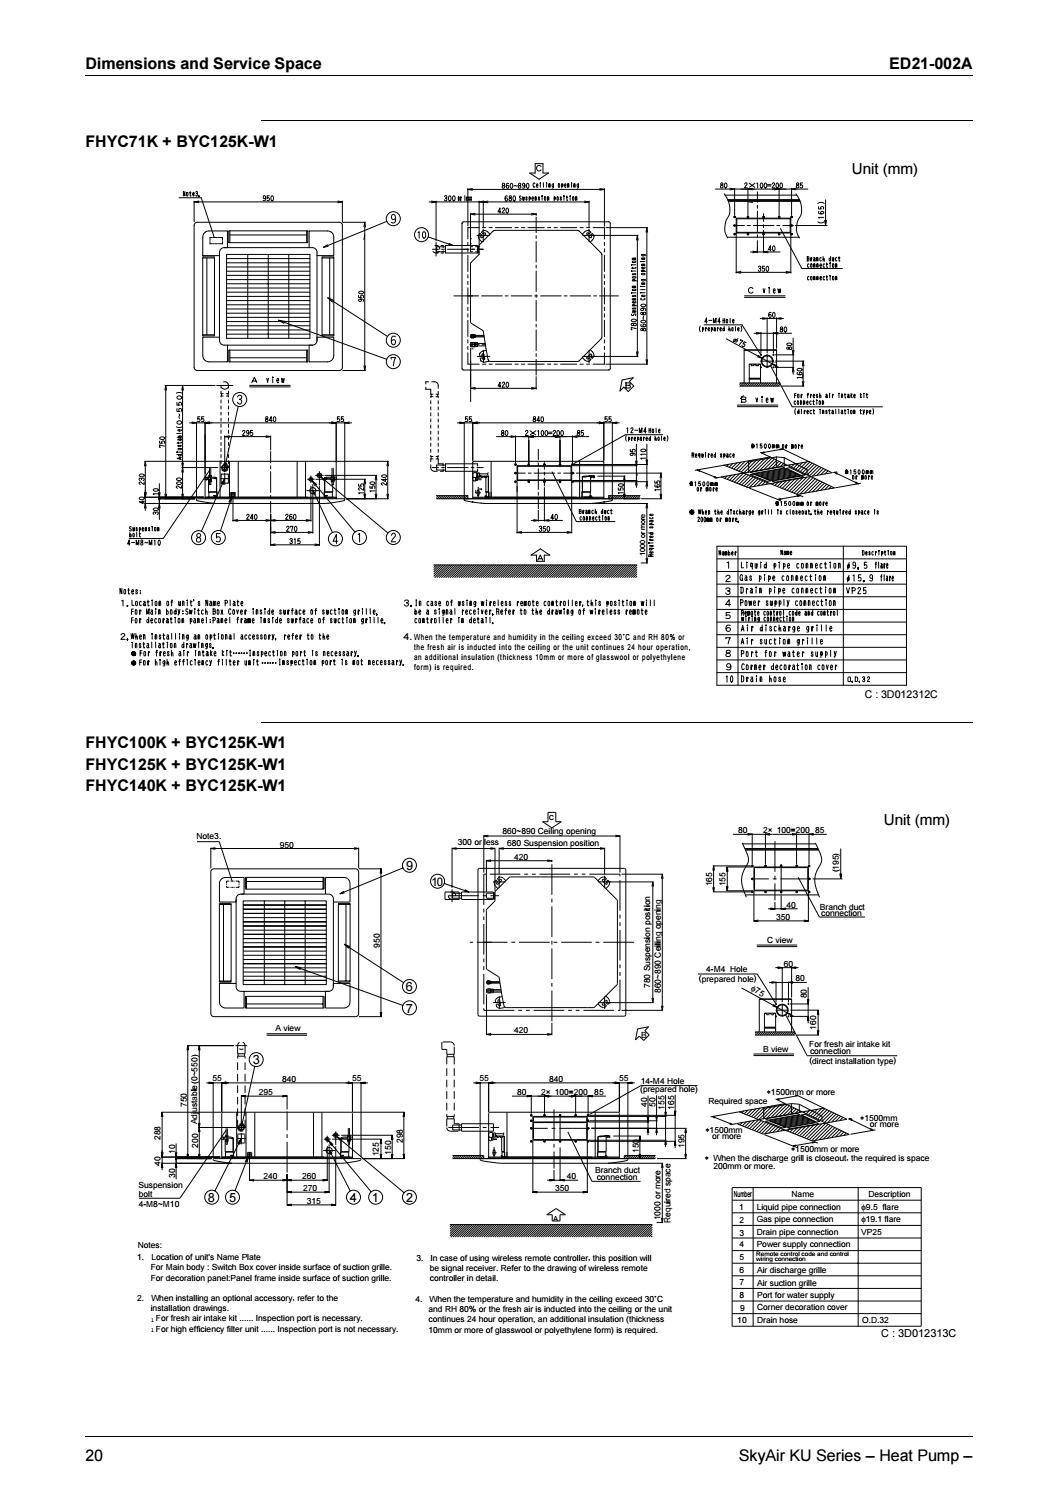 Daikin engineering data split ,skyair ku (fhyc kve,fhy bve) by